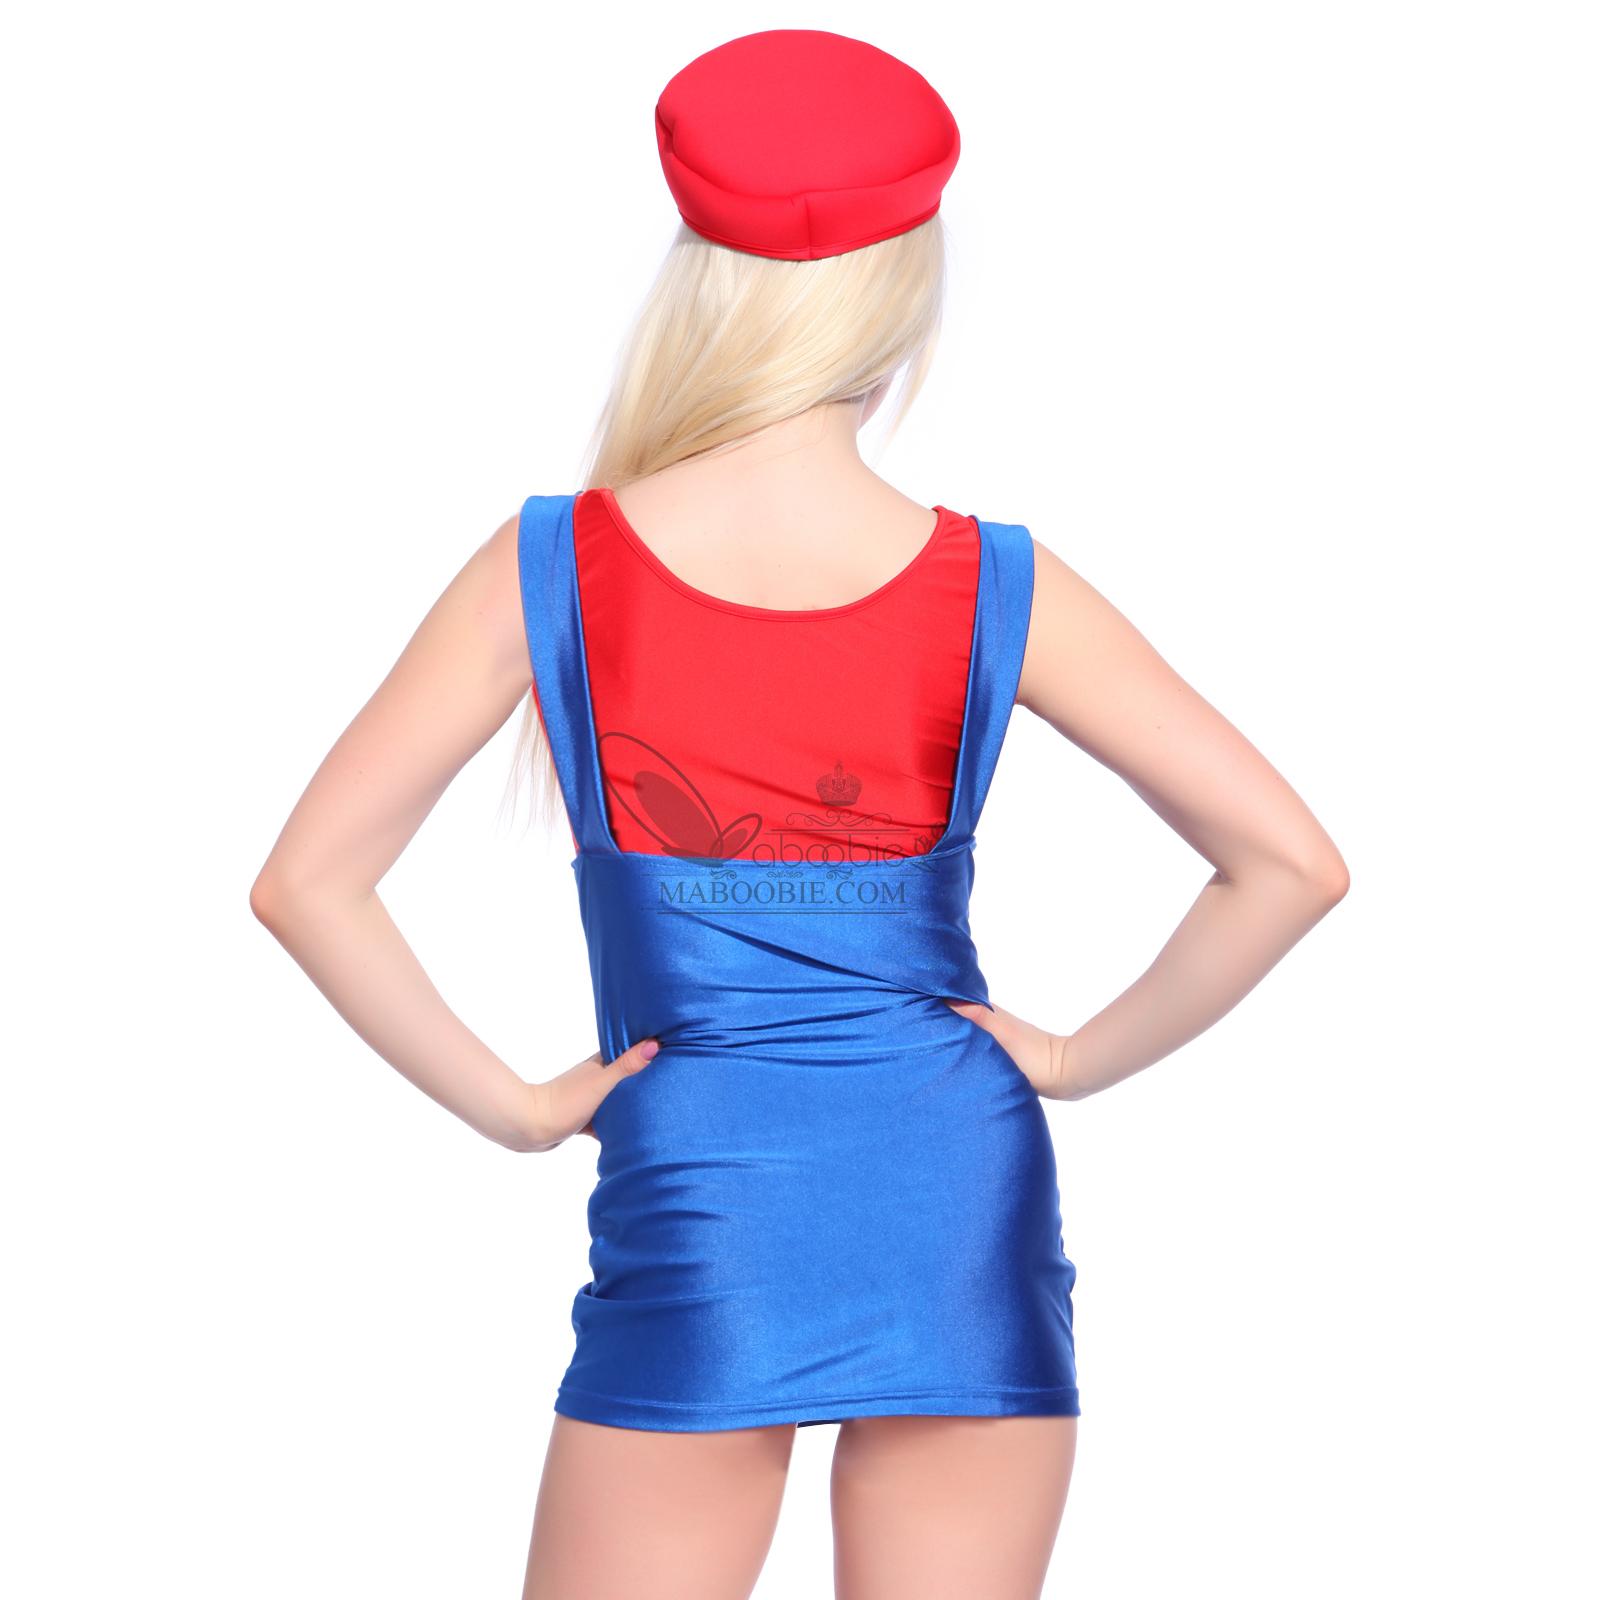 deguisement costume super mario luigi femme plombier jeux rouge vert s m l ebay. Black Bedroom Furniture Sets. Home Design Ideas